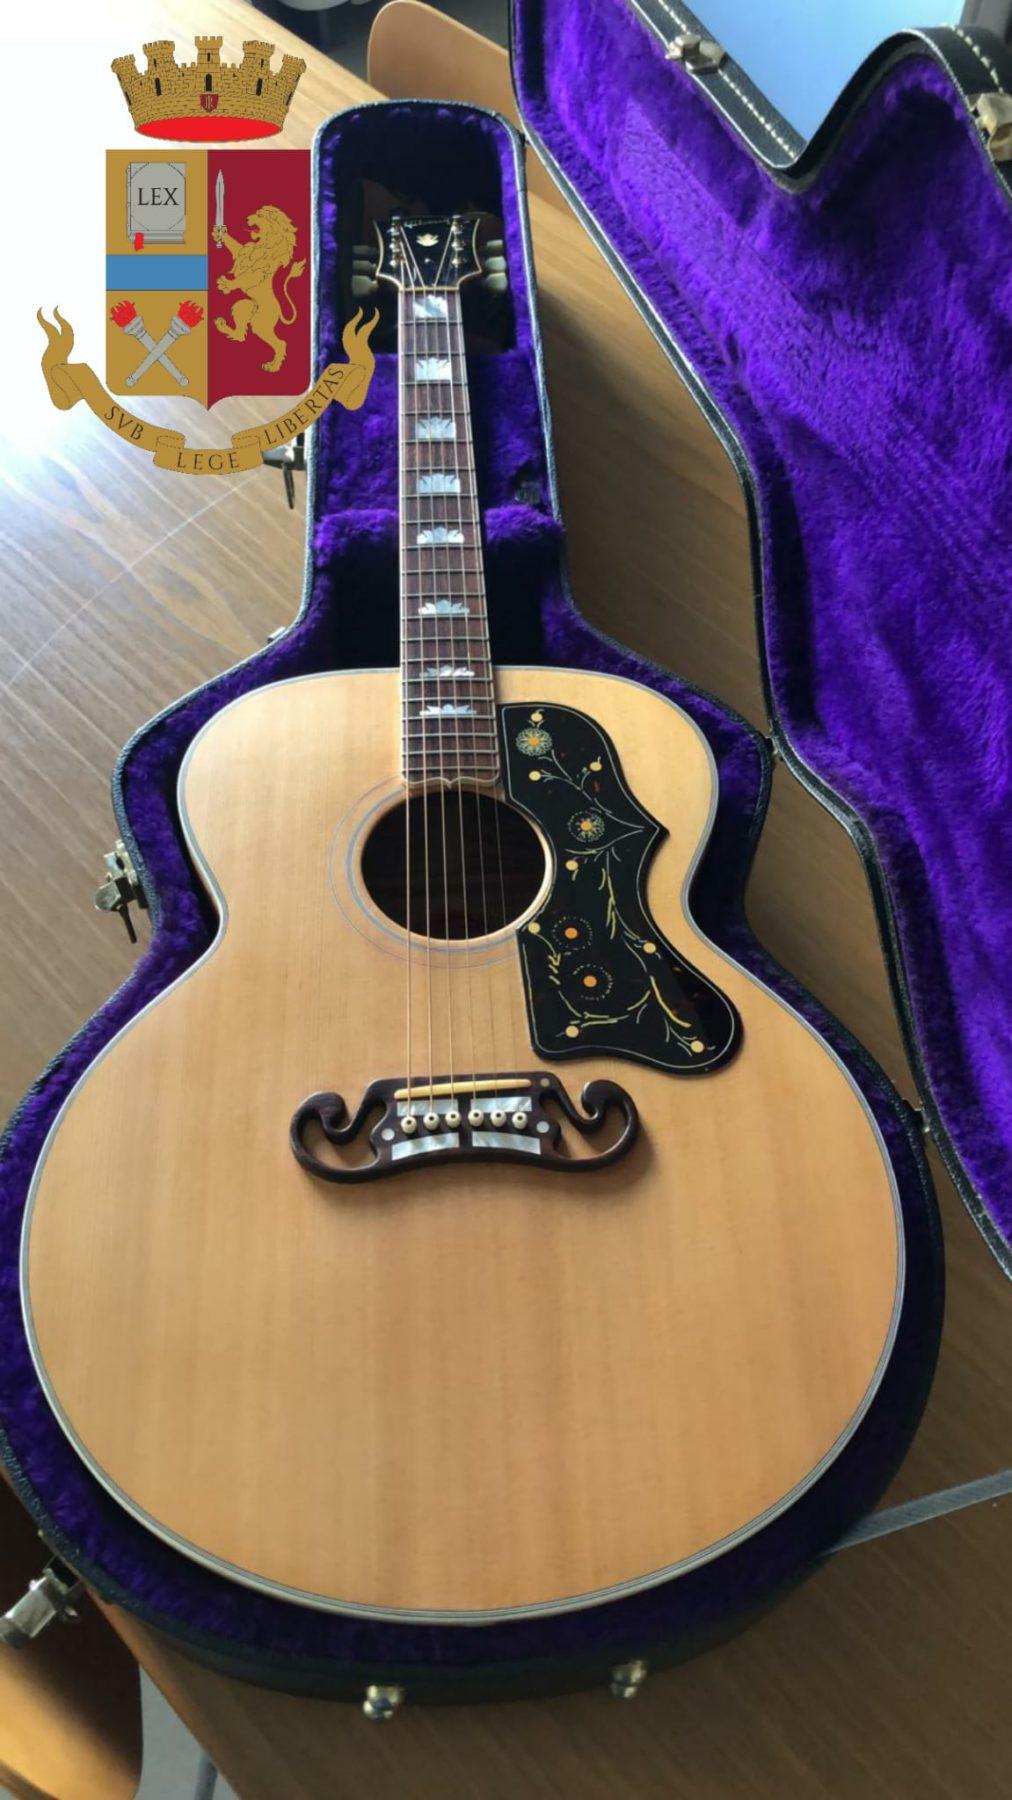 la chitarra di Elvis Presley